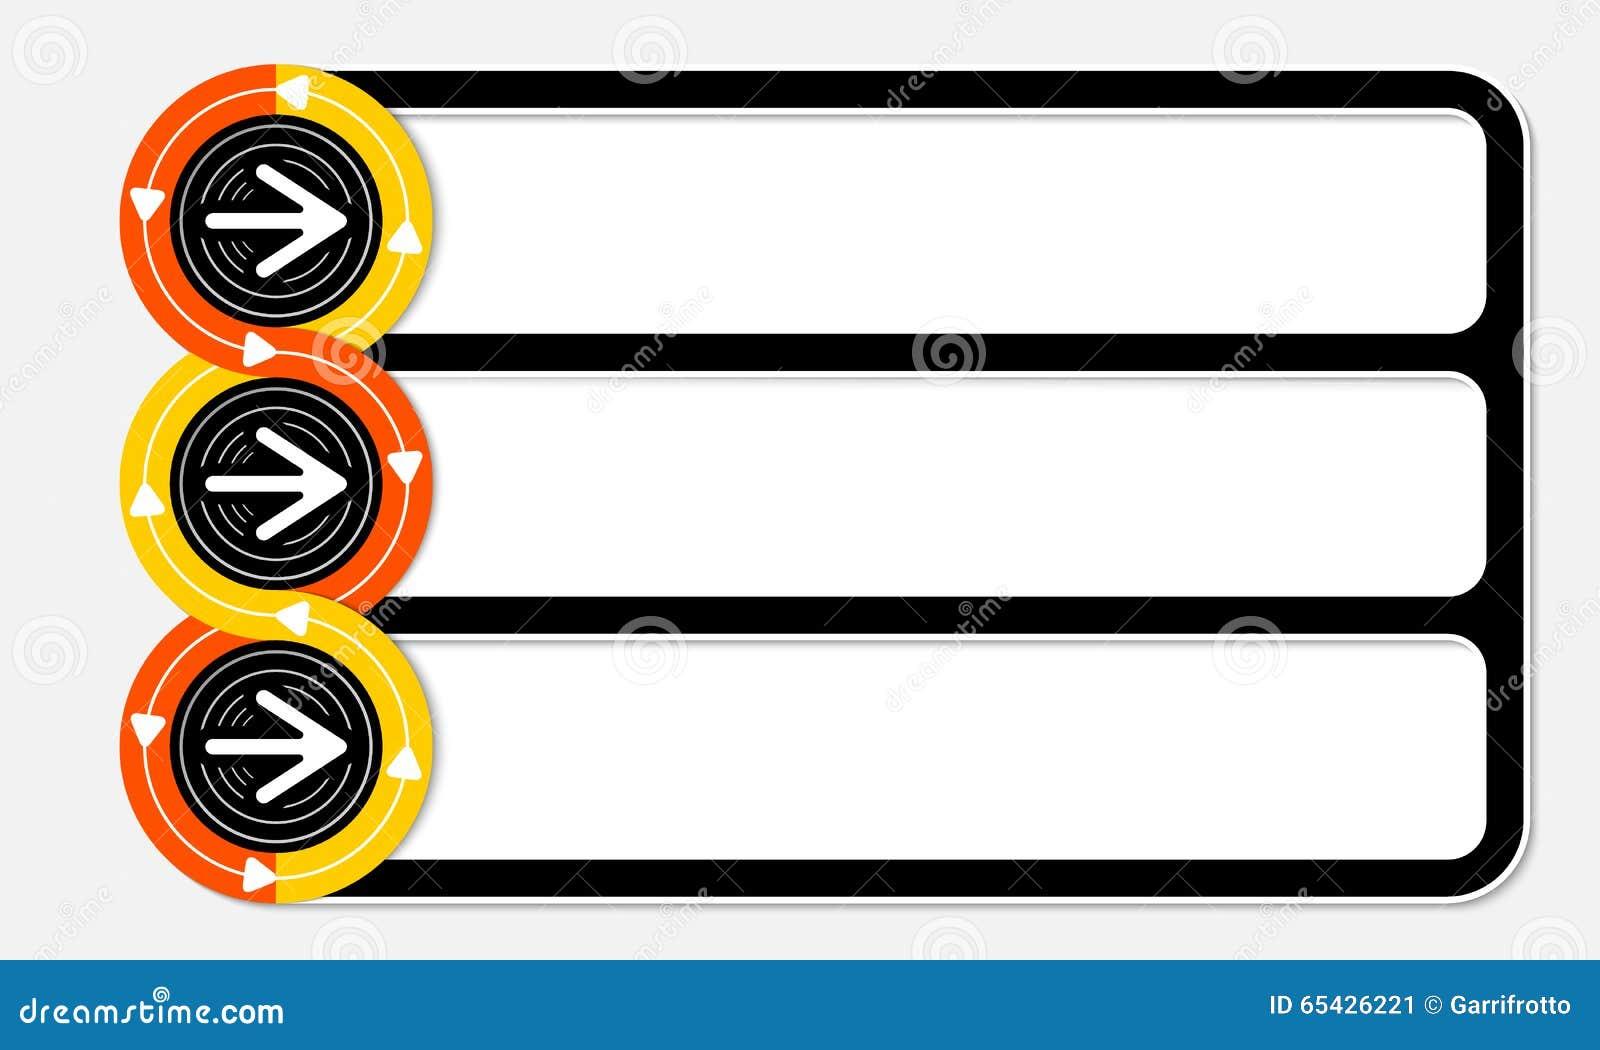 Three connected frames stock illustration. Illustration of frame ...